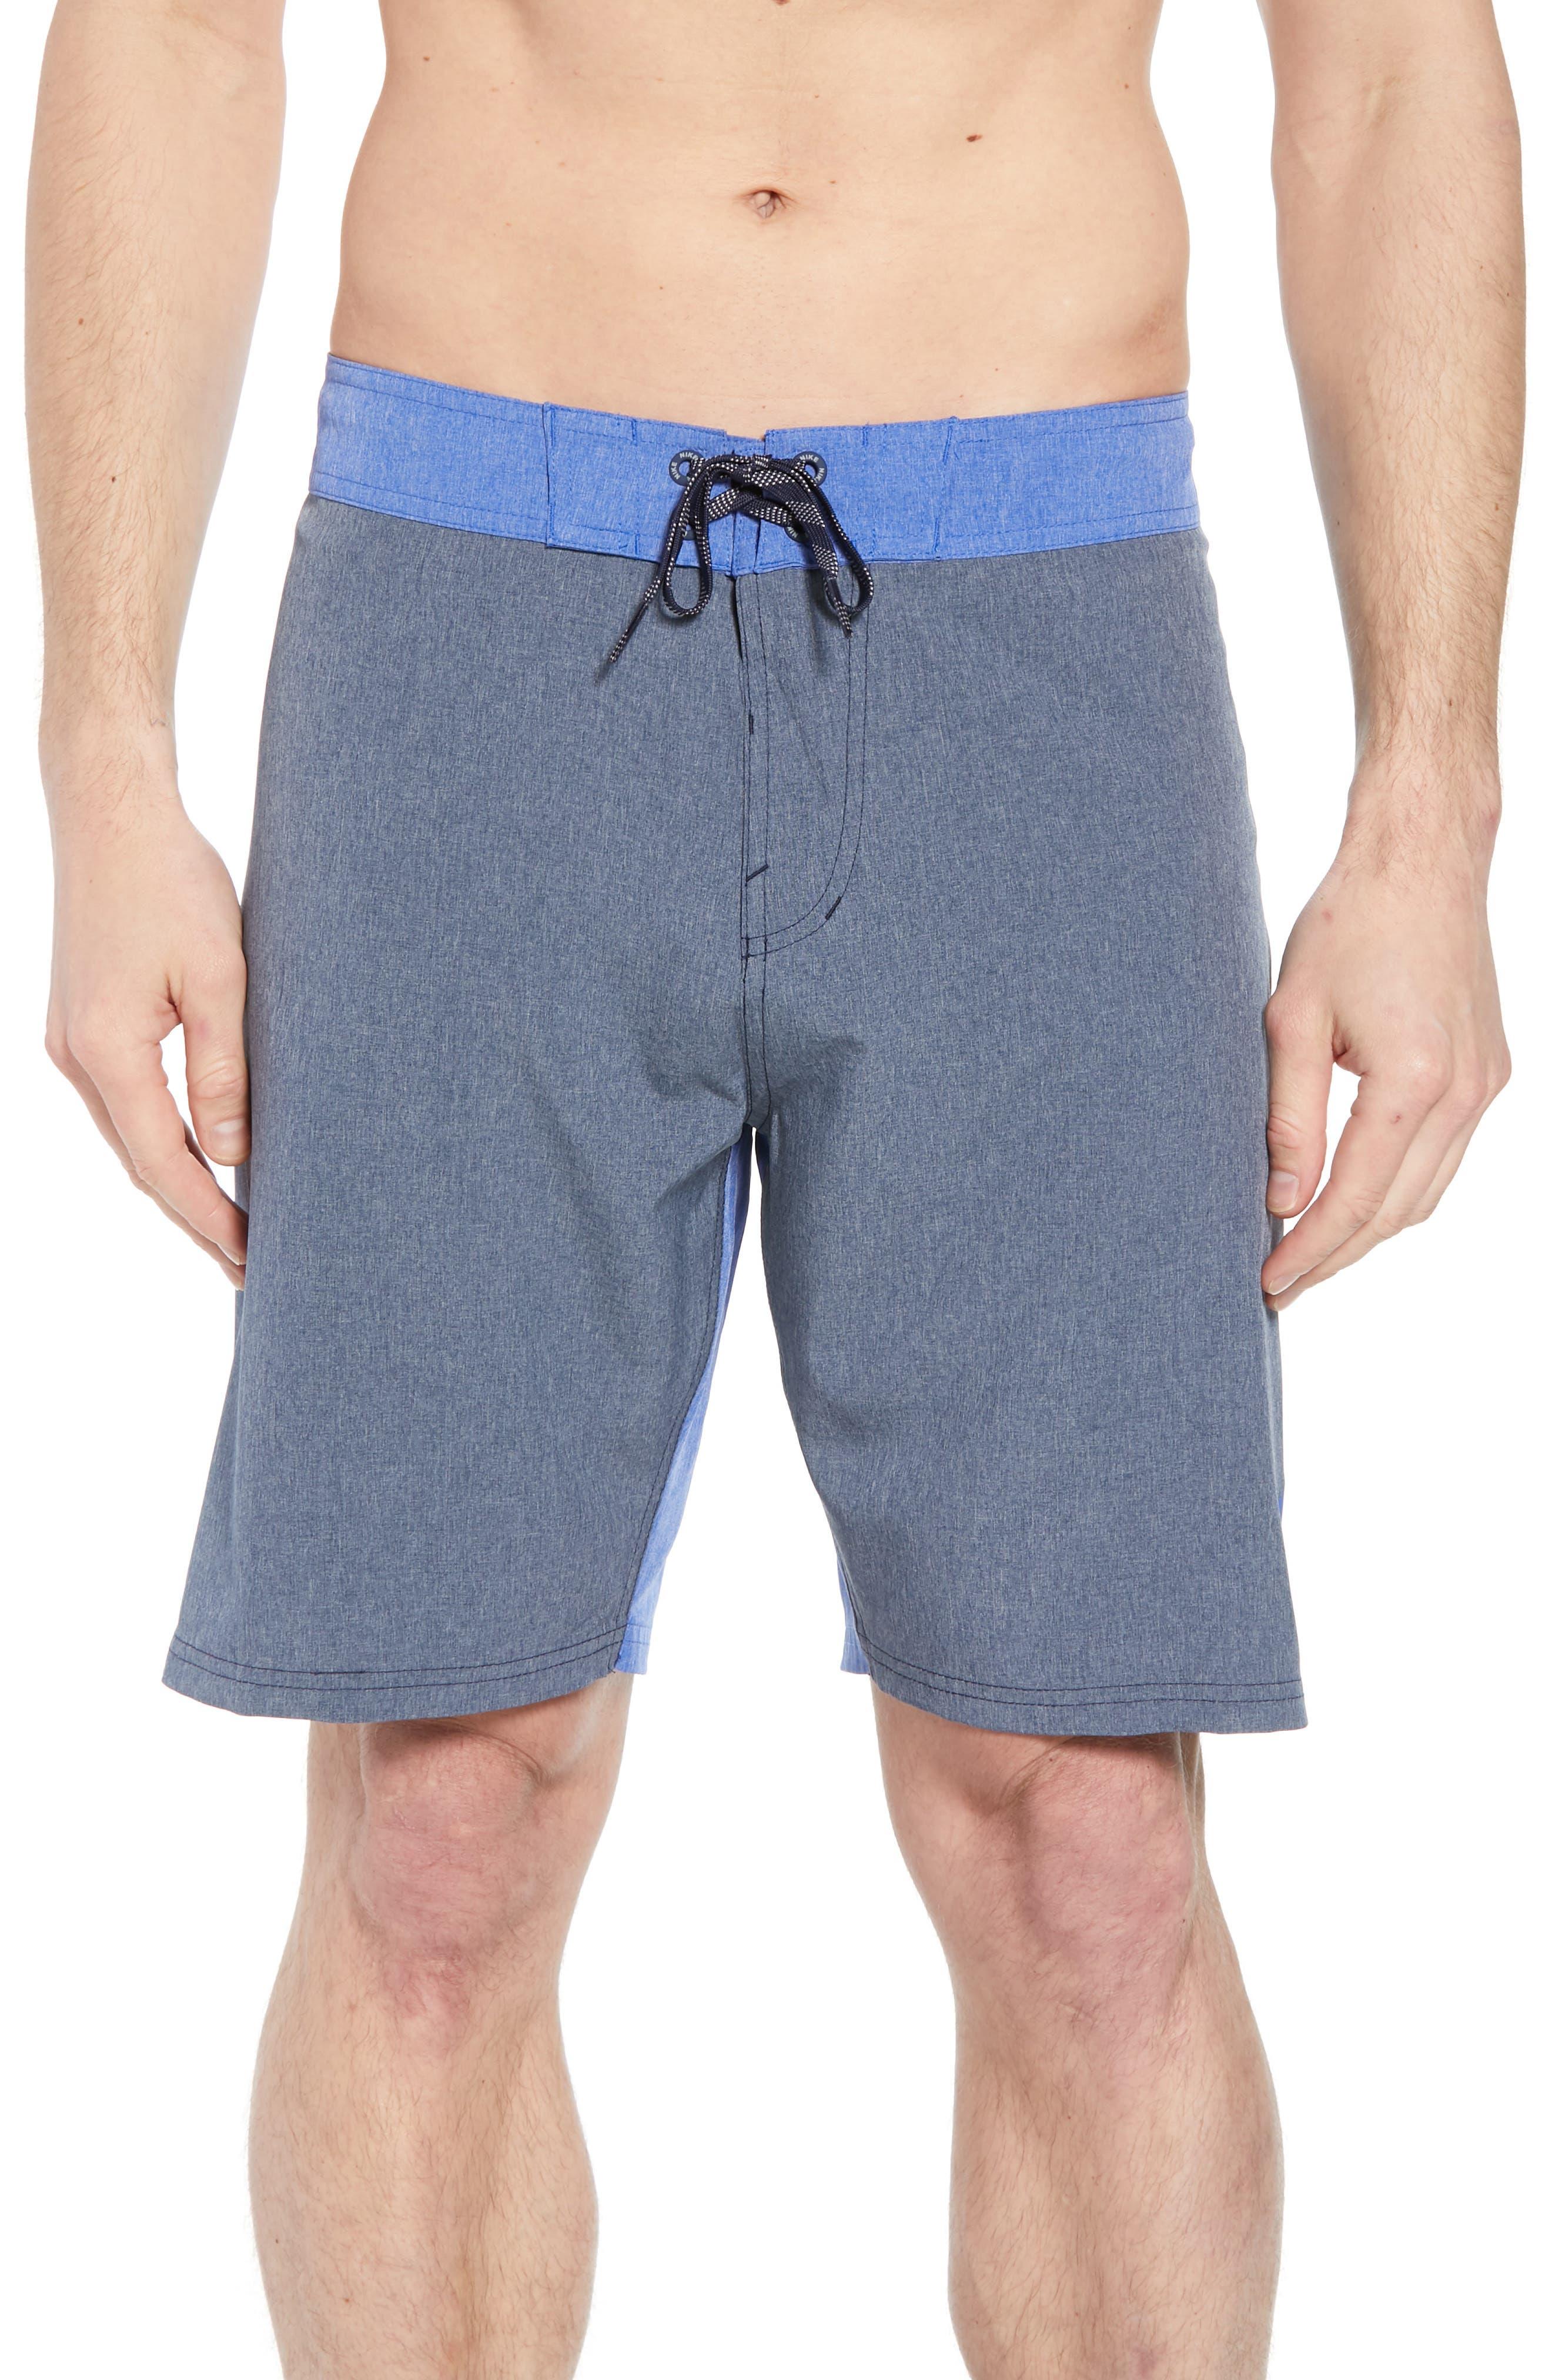 Vortex Board Shorts,                         Main,                         color, Obsidian